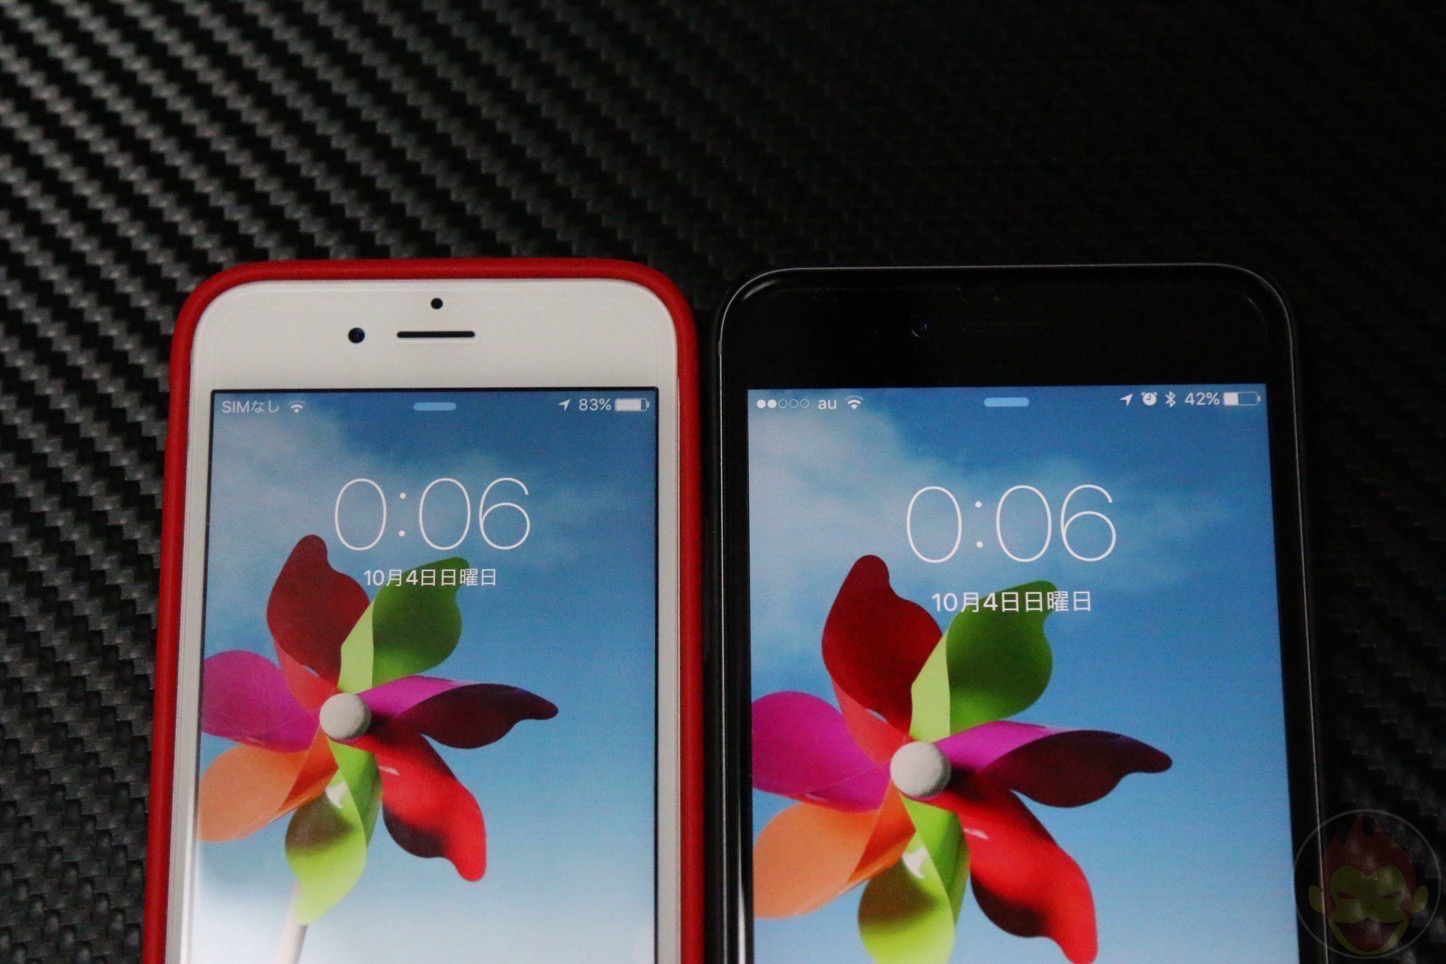 IPhone6s 6splus battery life